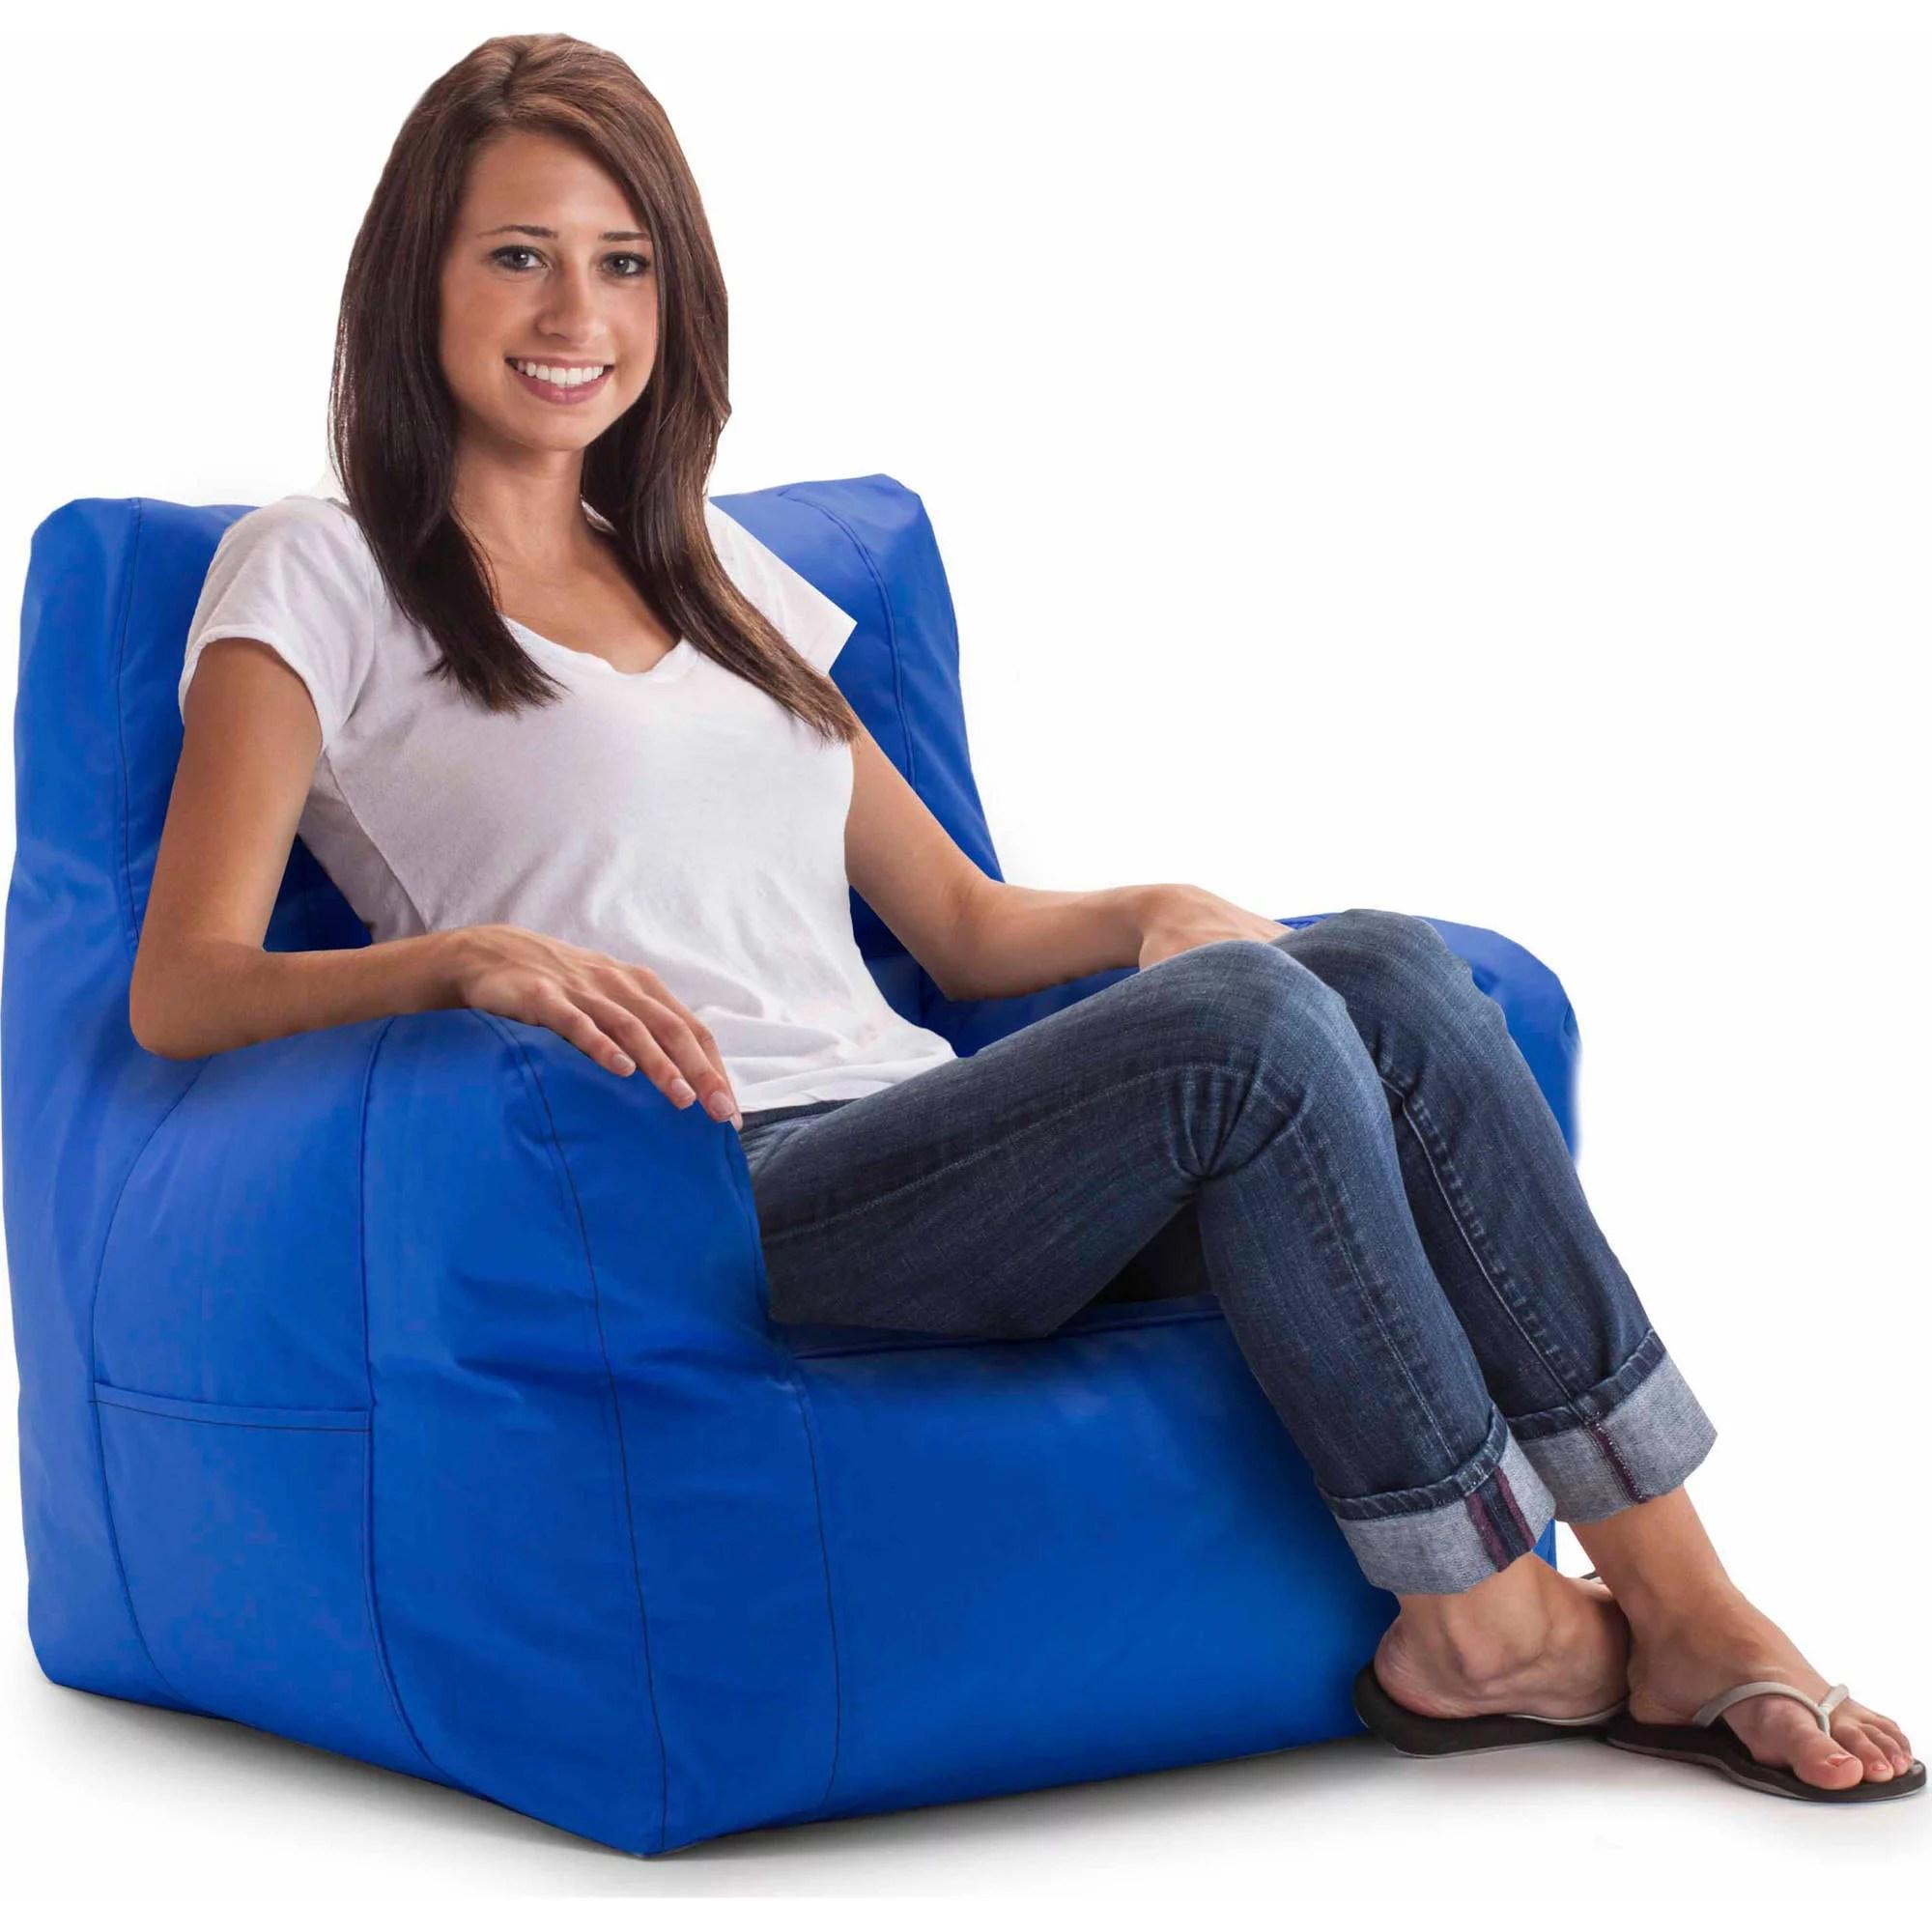 big joe bean bag chair cheap outdoor lounge chairs smartmax duo multiple colors walmart com